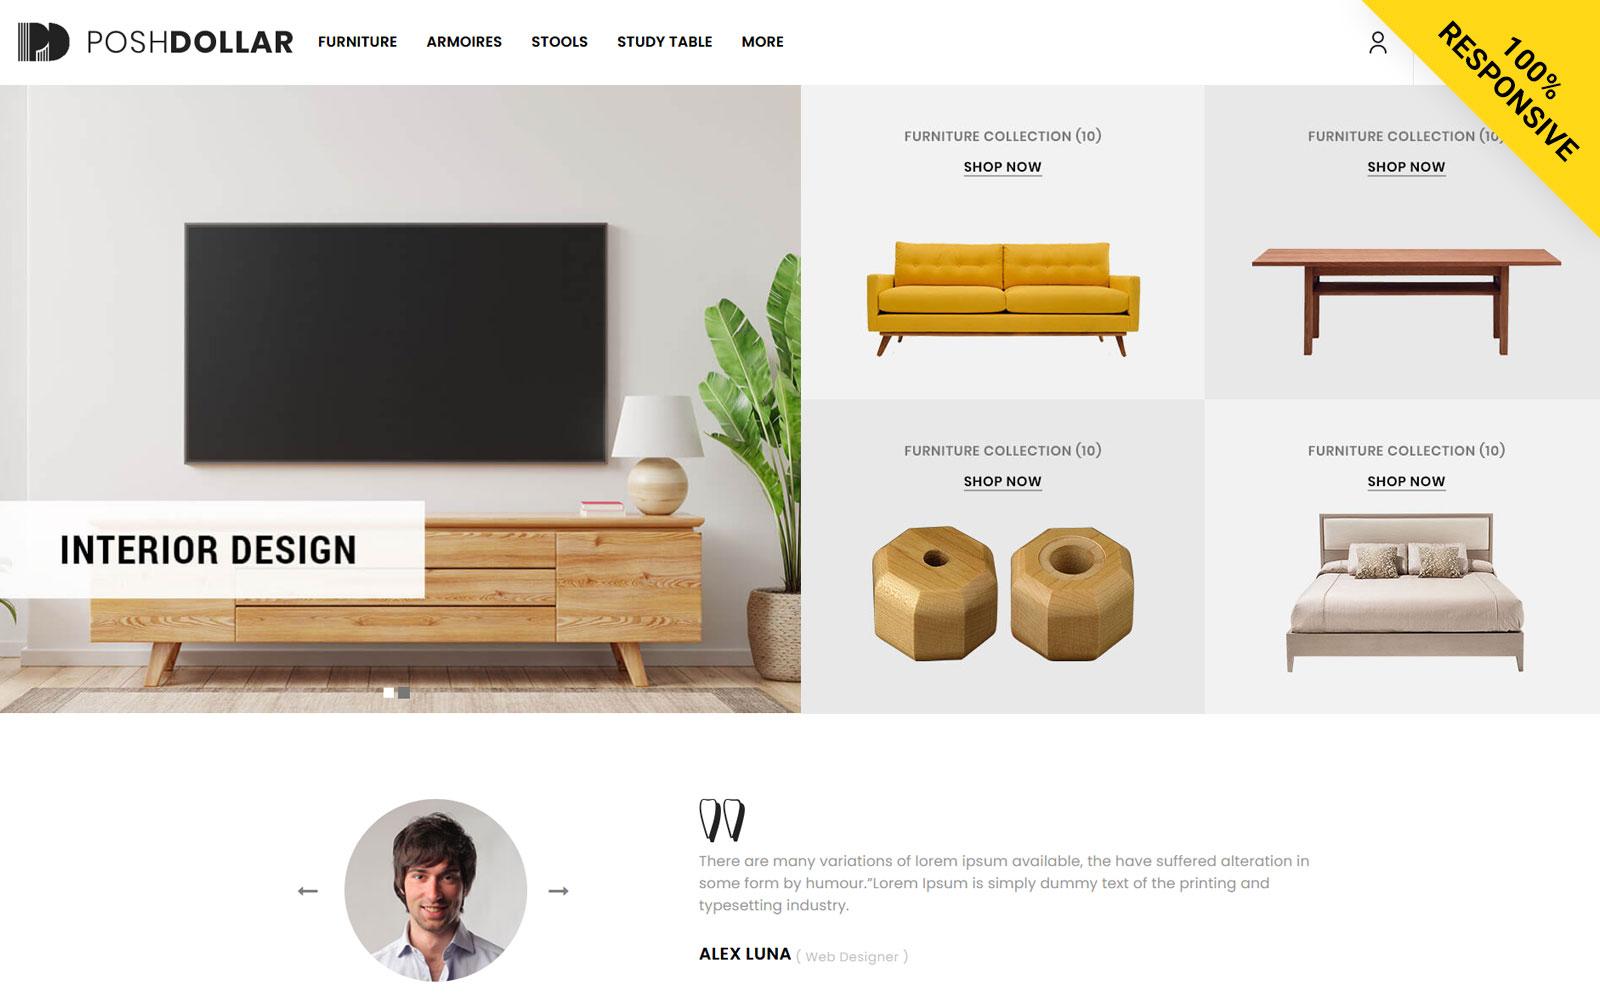 Poshdollar - Furniture Store Opencart Template